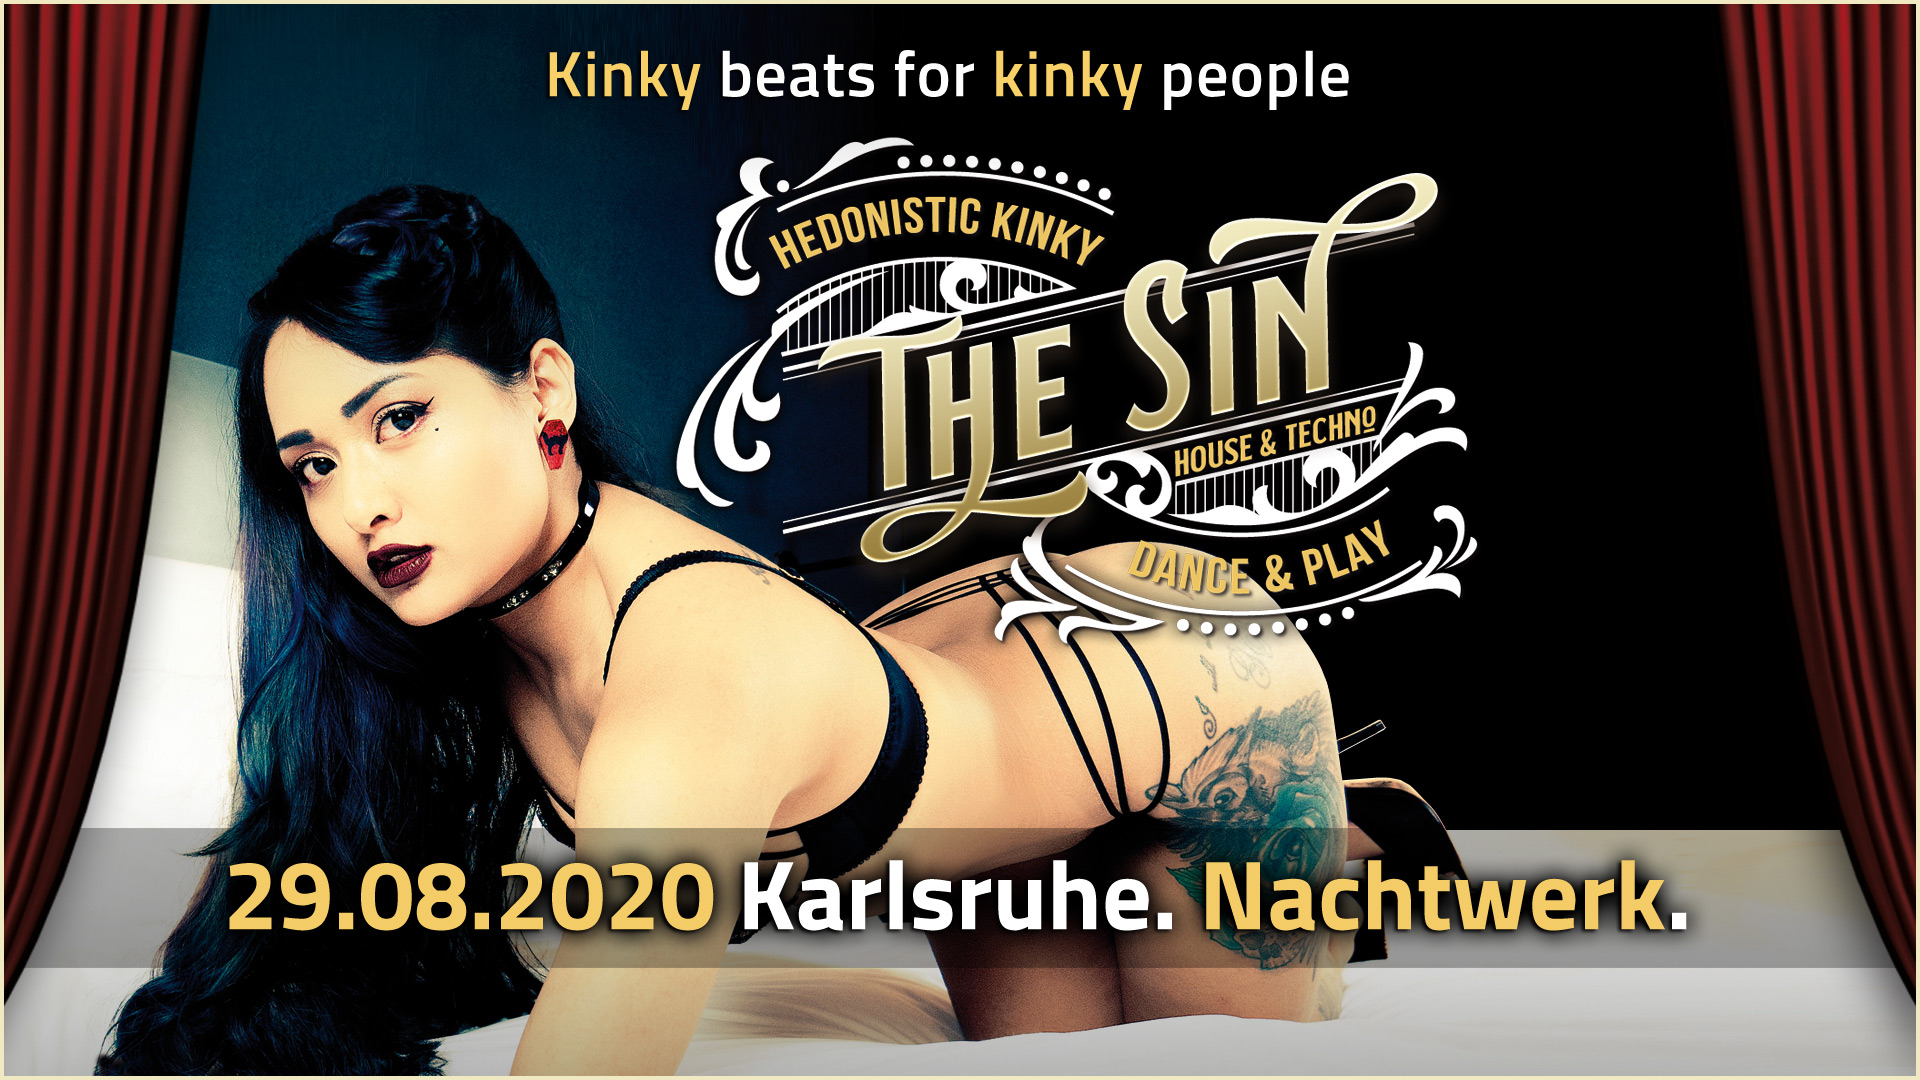 THE SIN » Die sündige hedonistische Kinky House & Techno Dance & Play-Party in Karlsruhe. Kinky beats für kinky people.